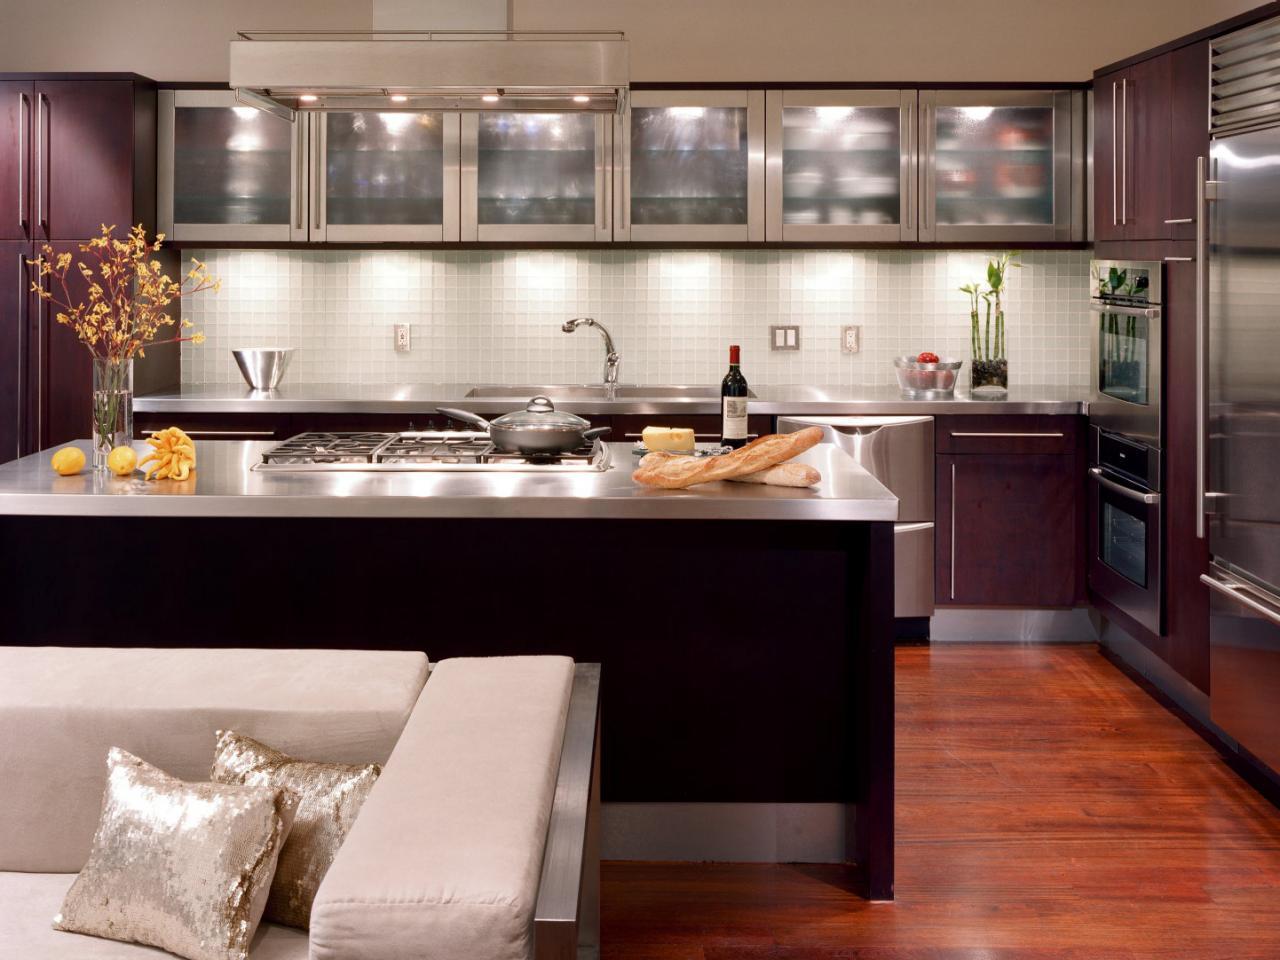 Beautiful Tags: kitchens · metallic photos · modern style ... modern kitchen design ideas